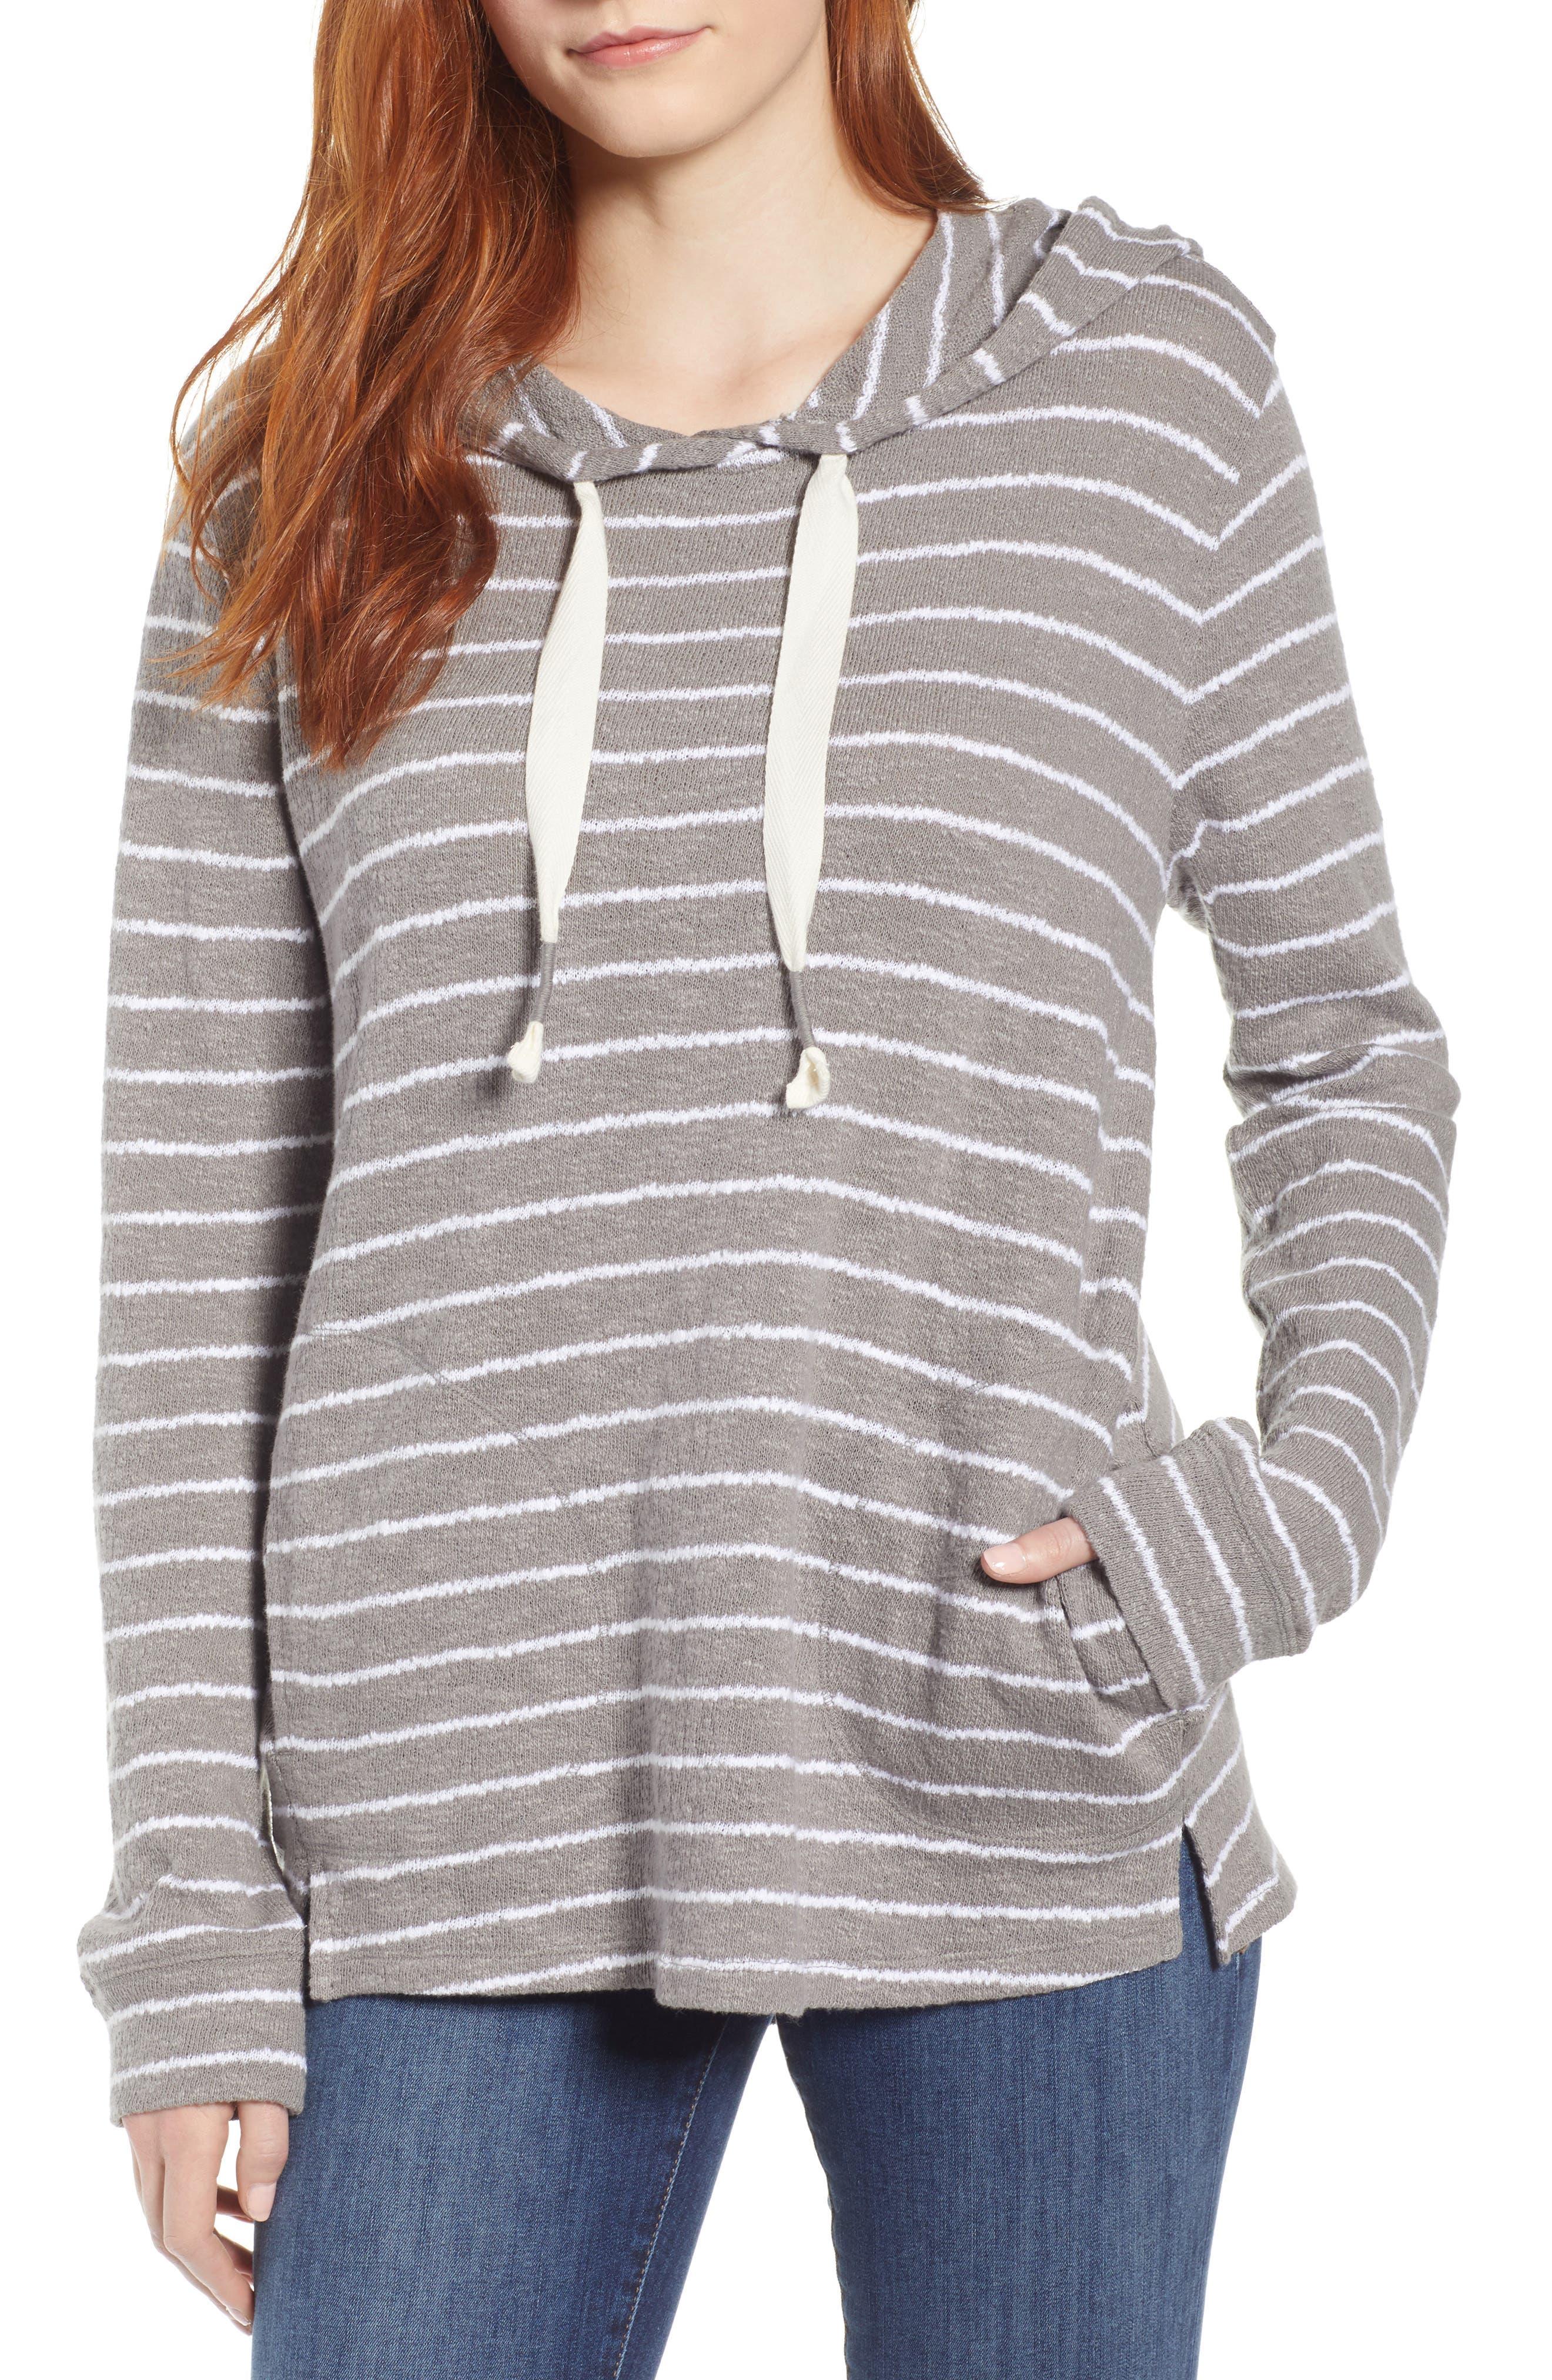 Zella Hooded Pullover Soft Sweatshirt Wine Color Size Medium Women's Clothing